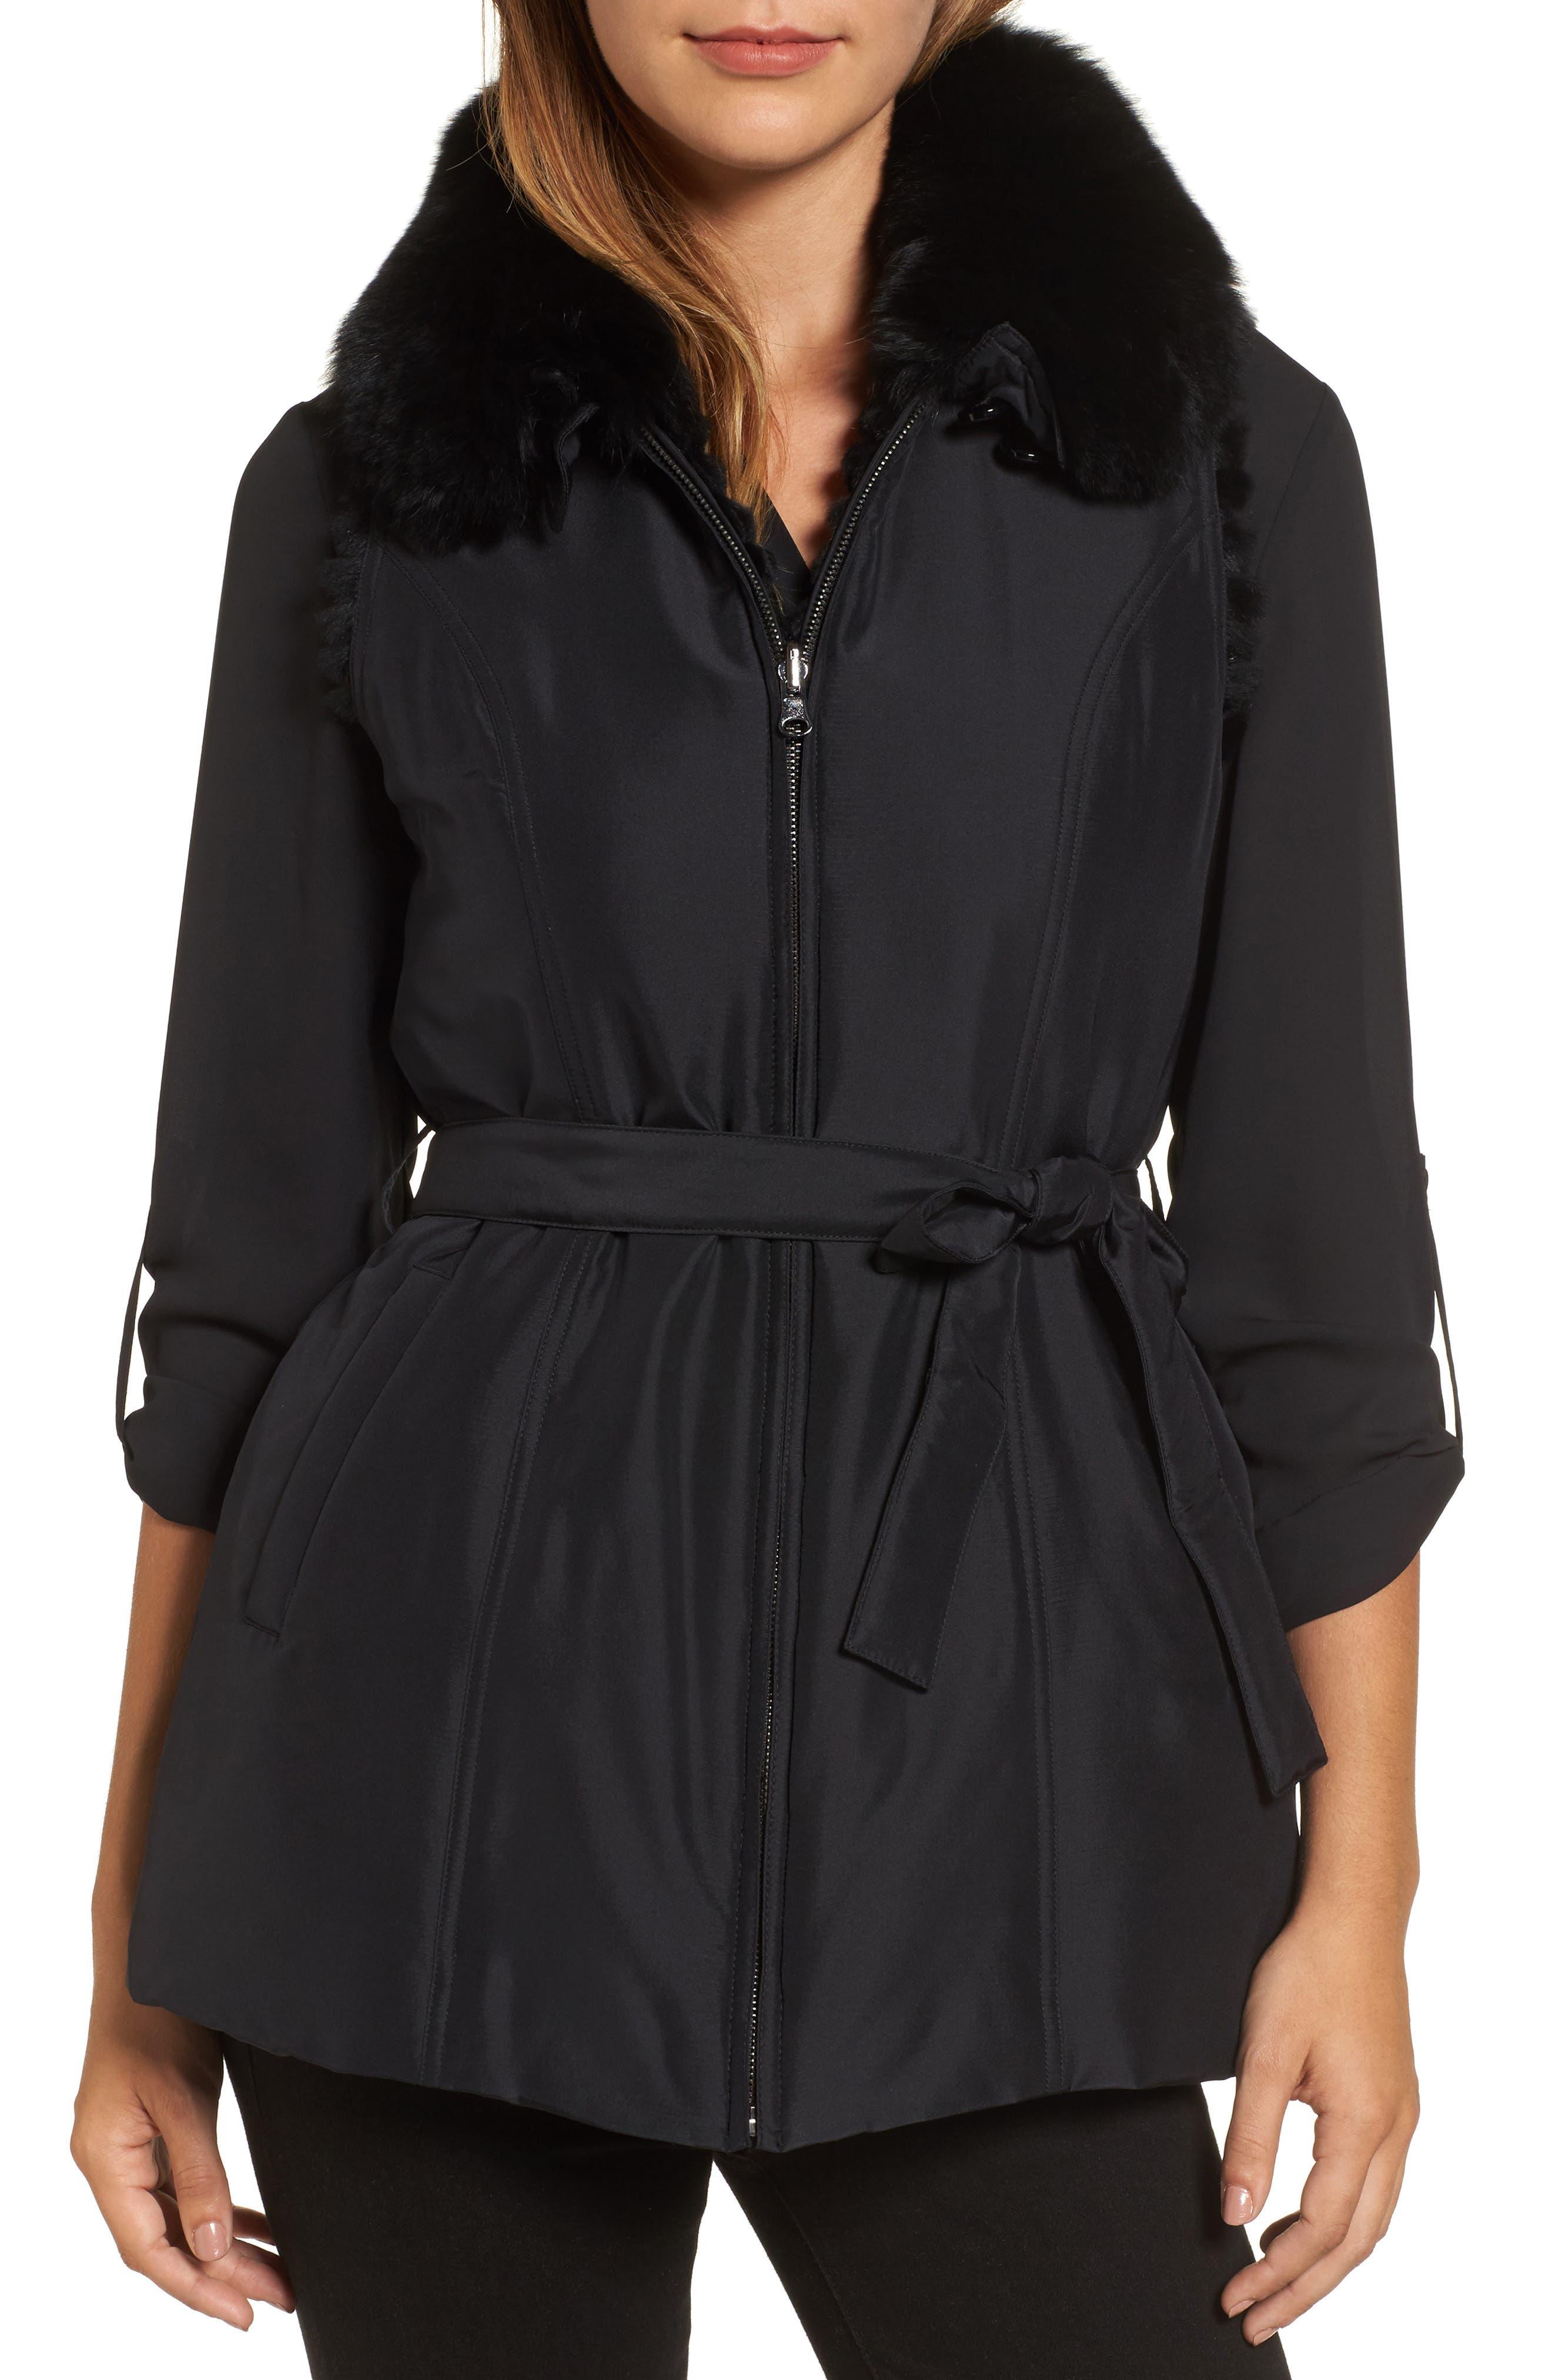 George Simonton Couture Reversible Silk Vest with Genuine Rabbit Fur & Genuine Fox Fur